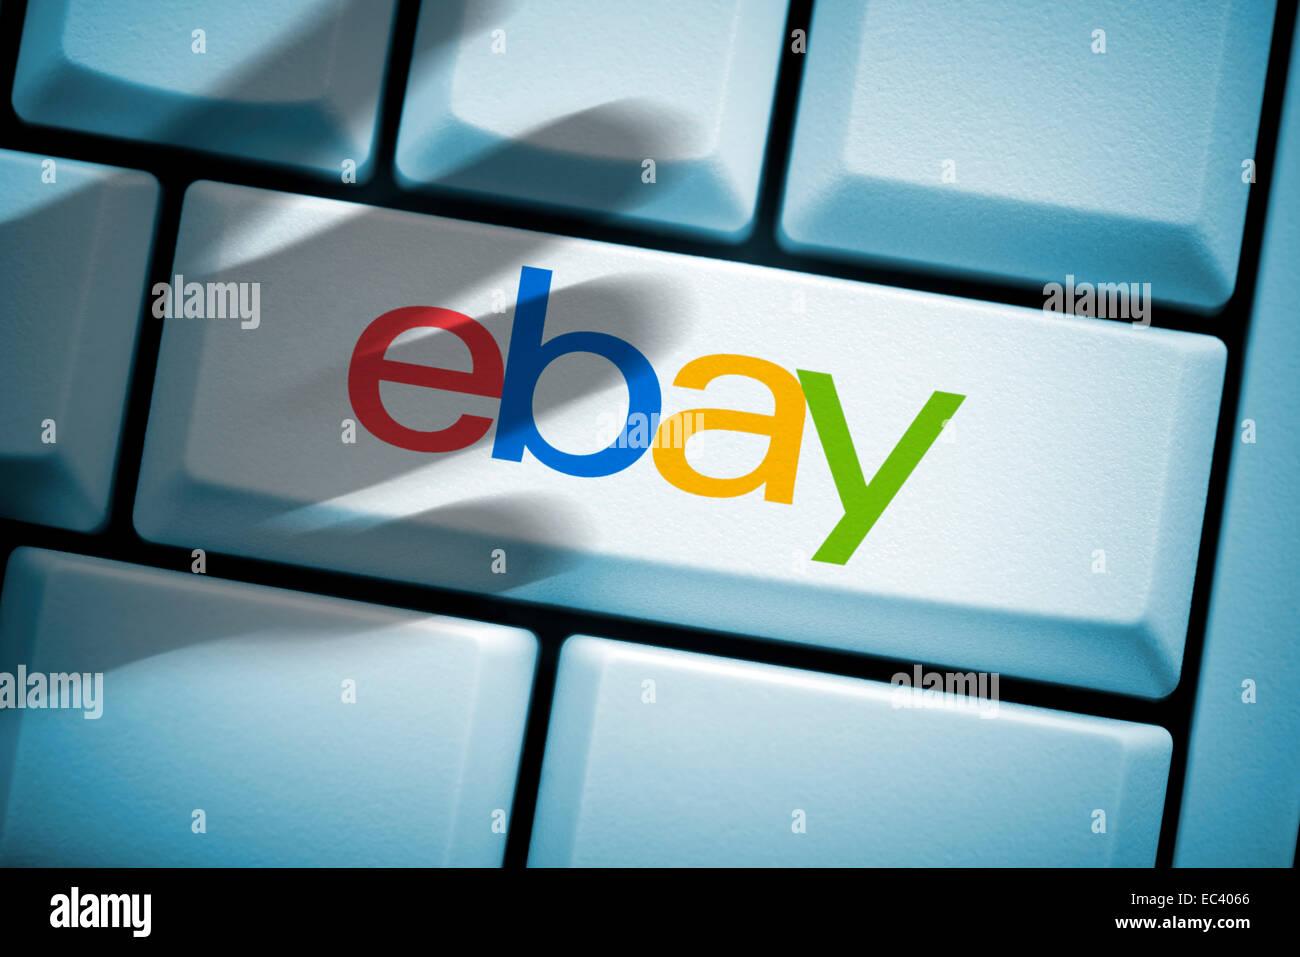 Computer key, ebay logo and black hand, hacked accounts - Stock Image